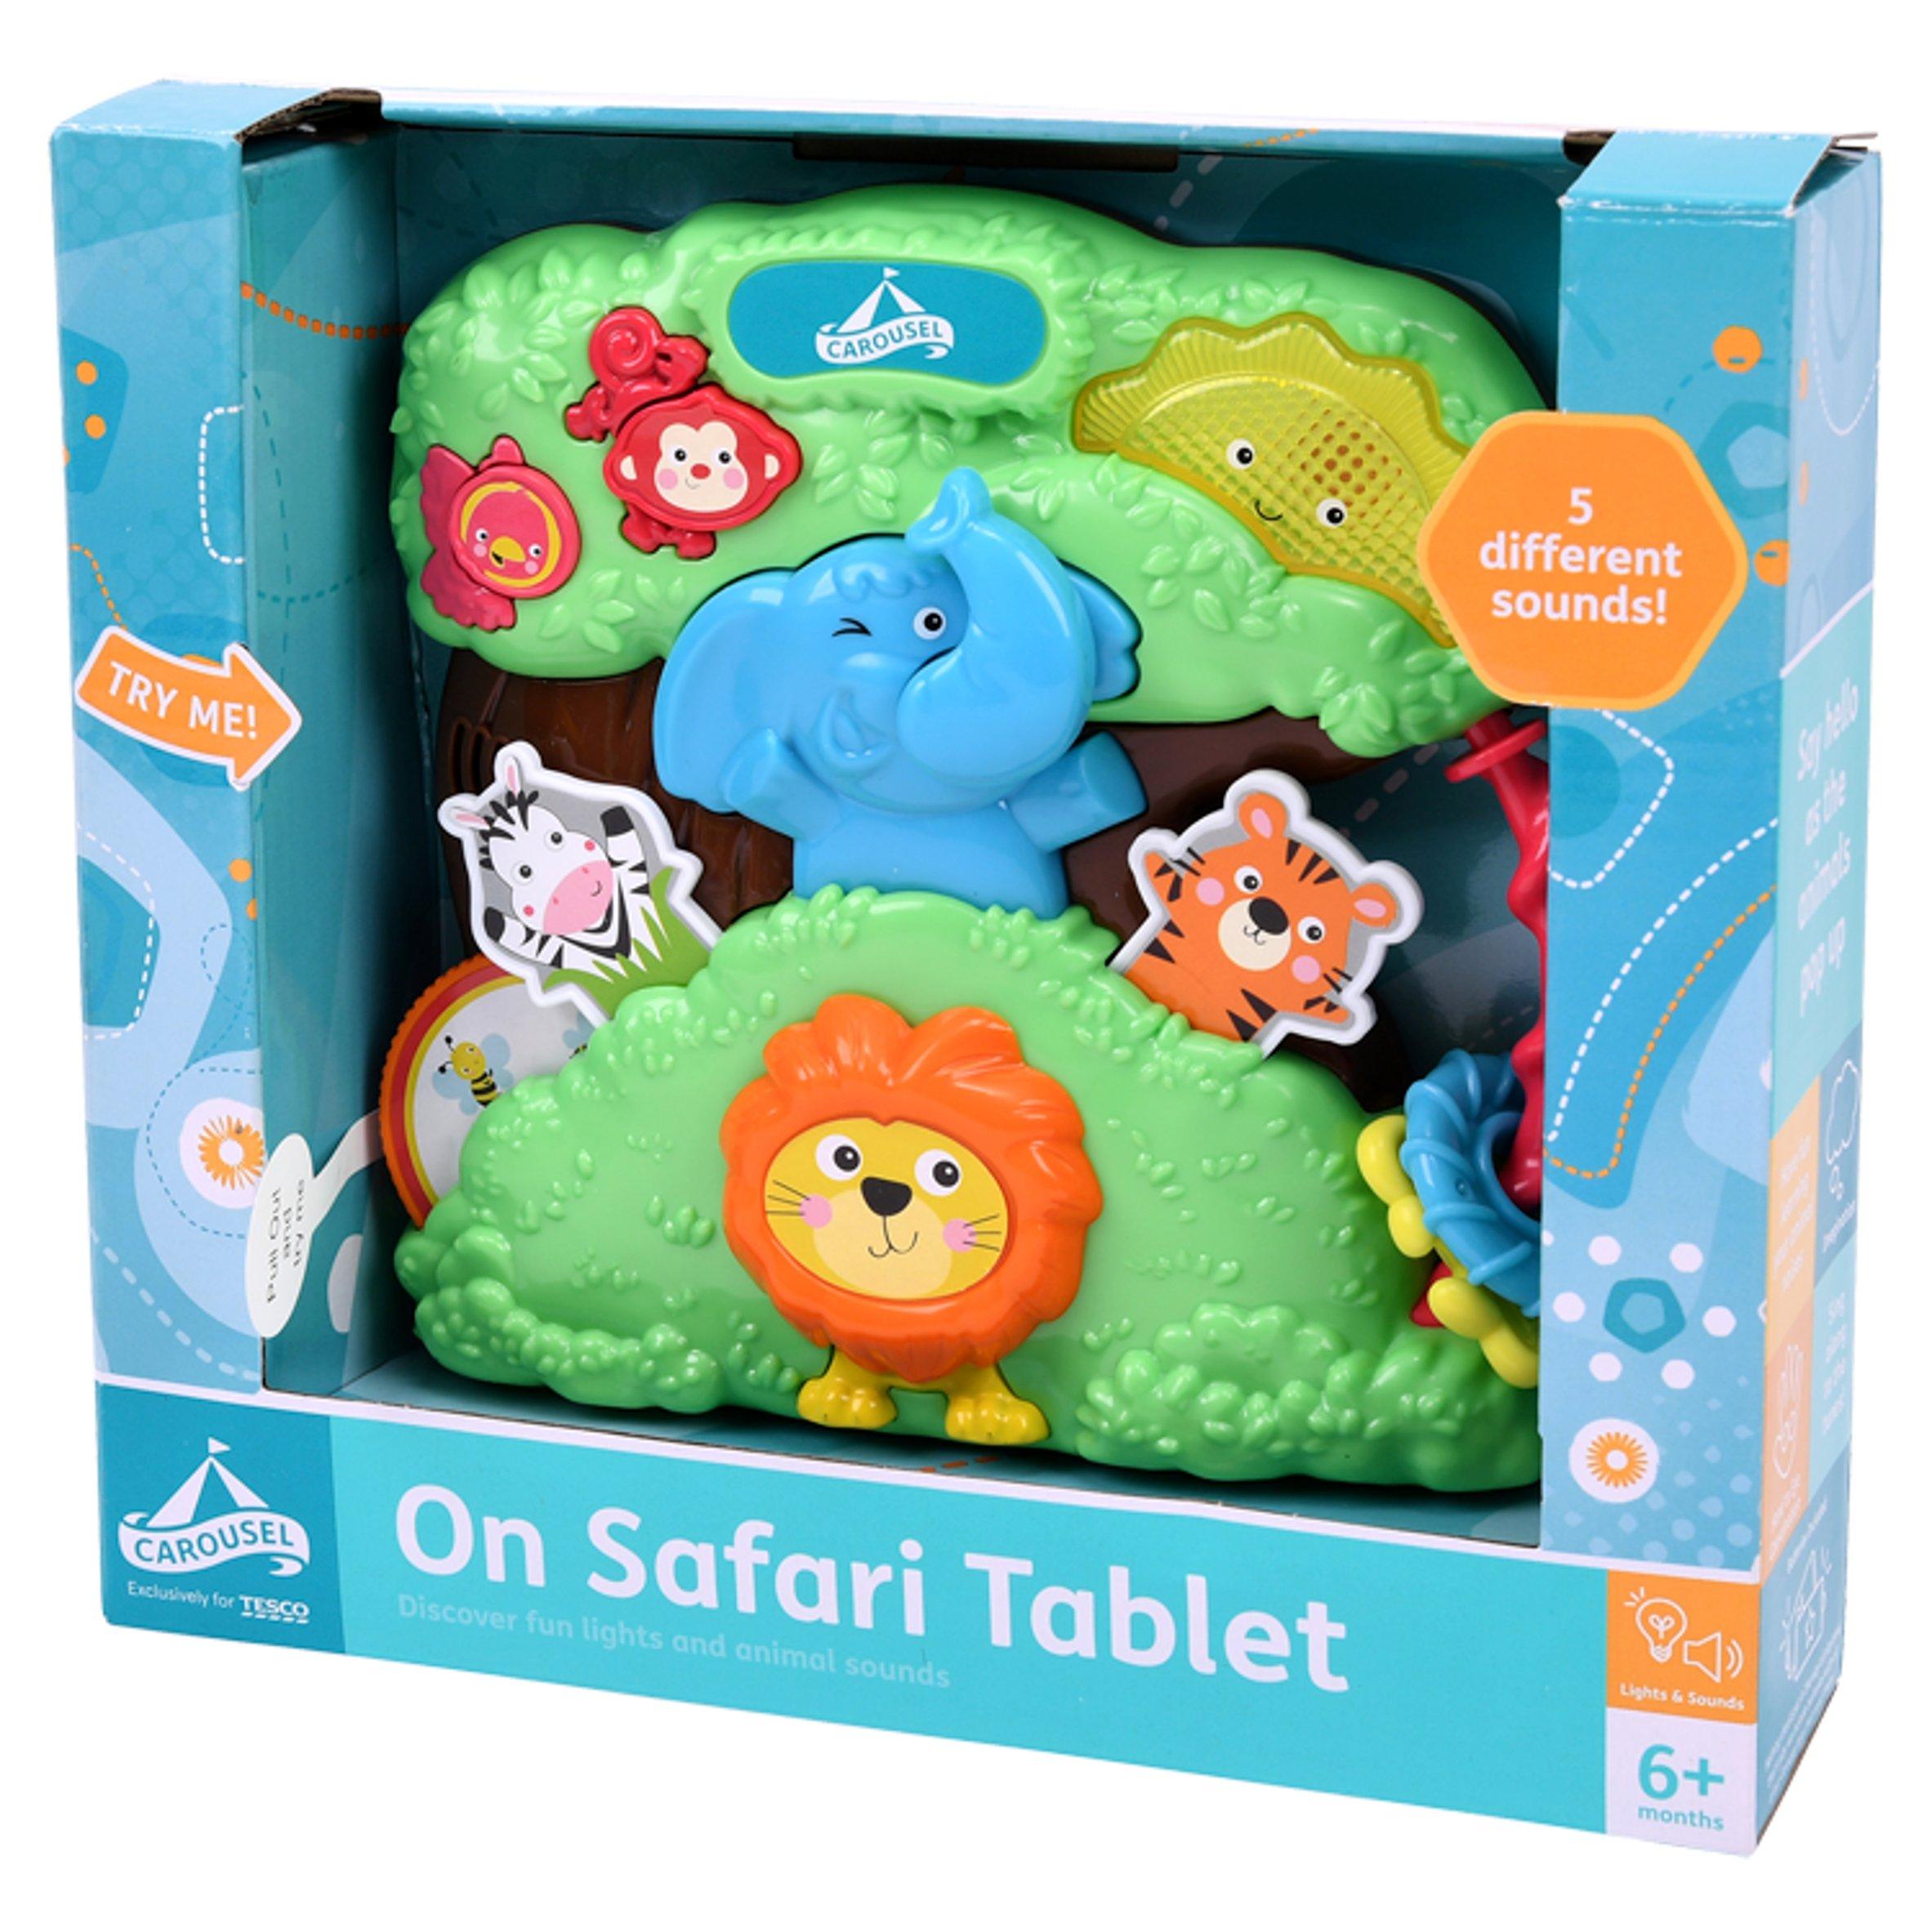 Carousel On Safari Tablet